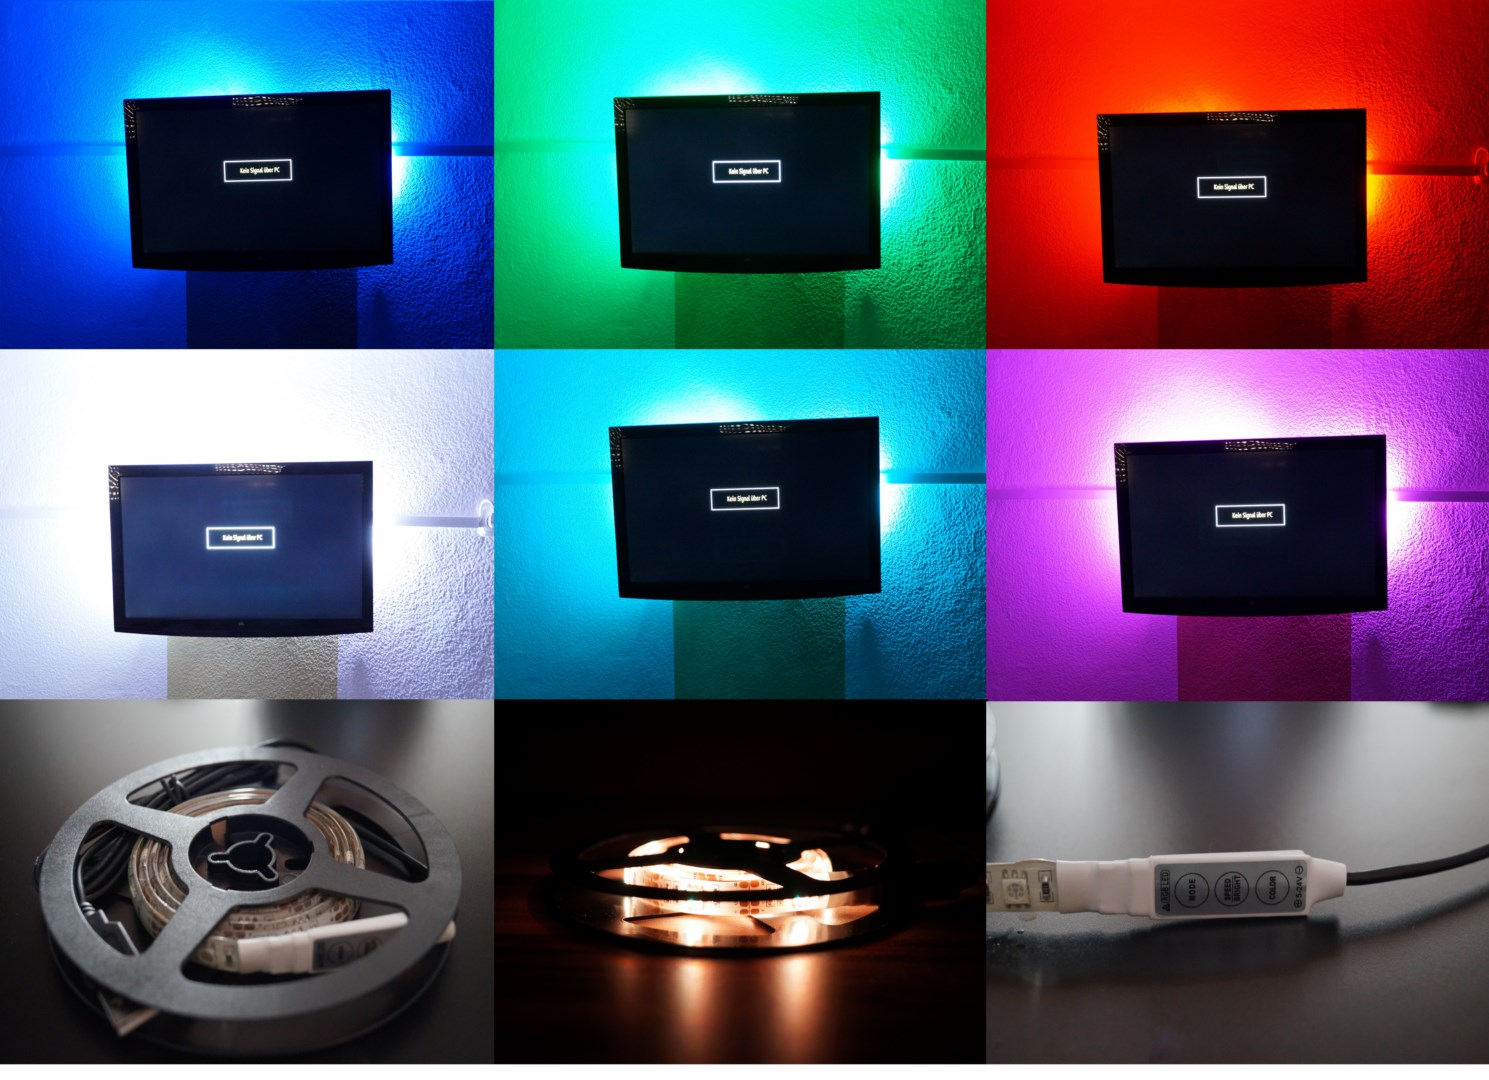 tv rgb led usb pc fernseher backlight hintergrund. Black Bedroom Furniture Sets. Home Design Ideas